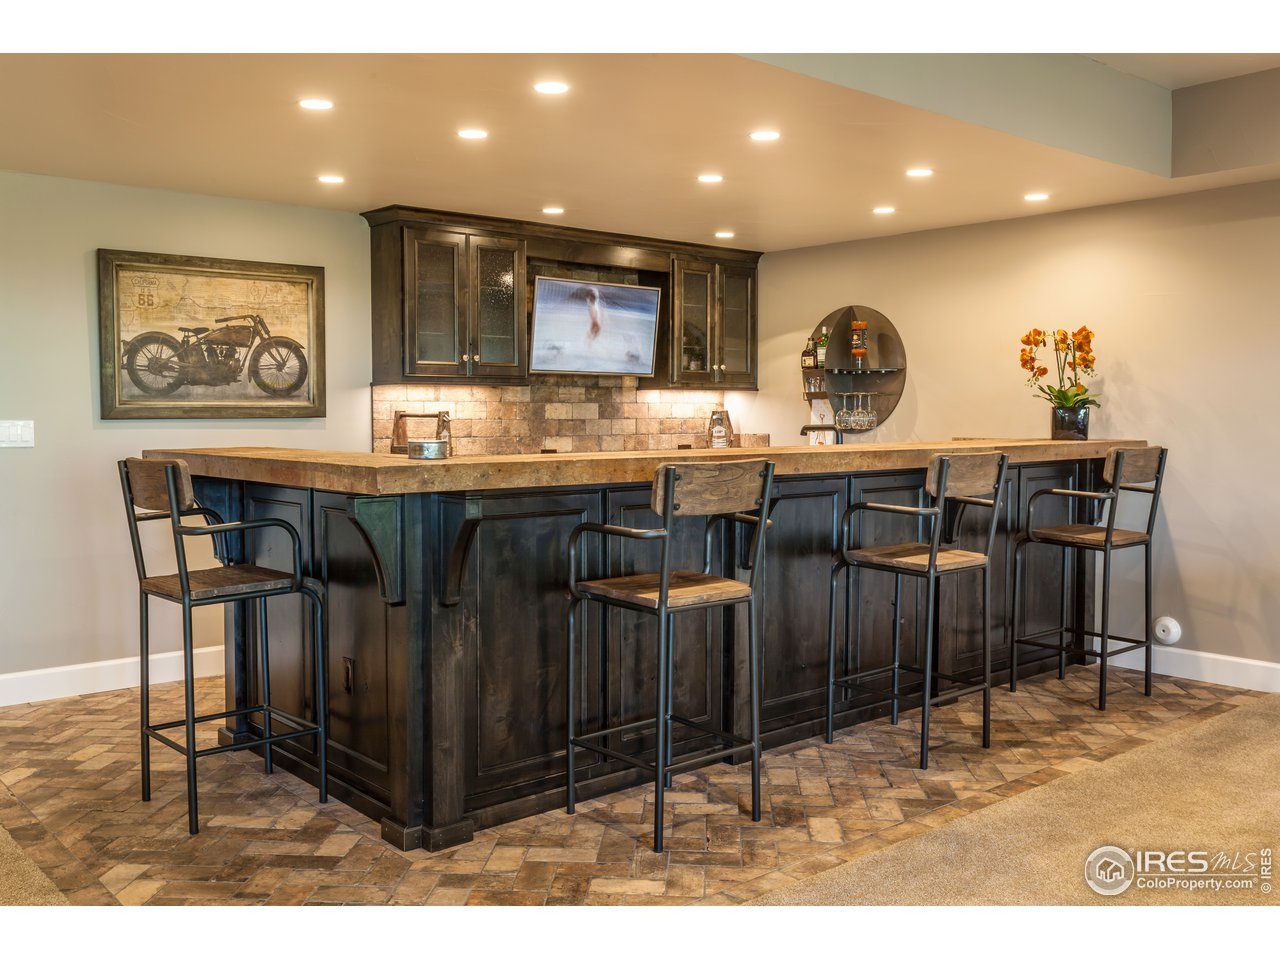 Photo of previously built home--basement bar